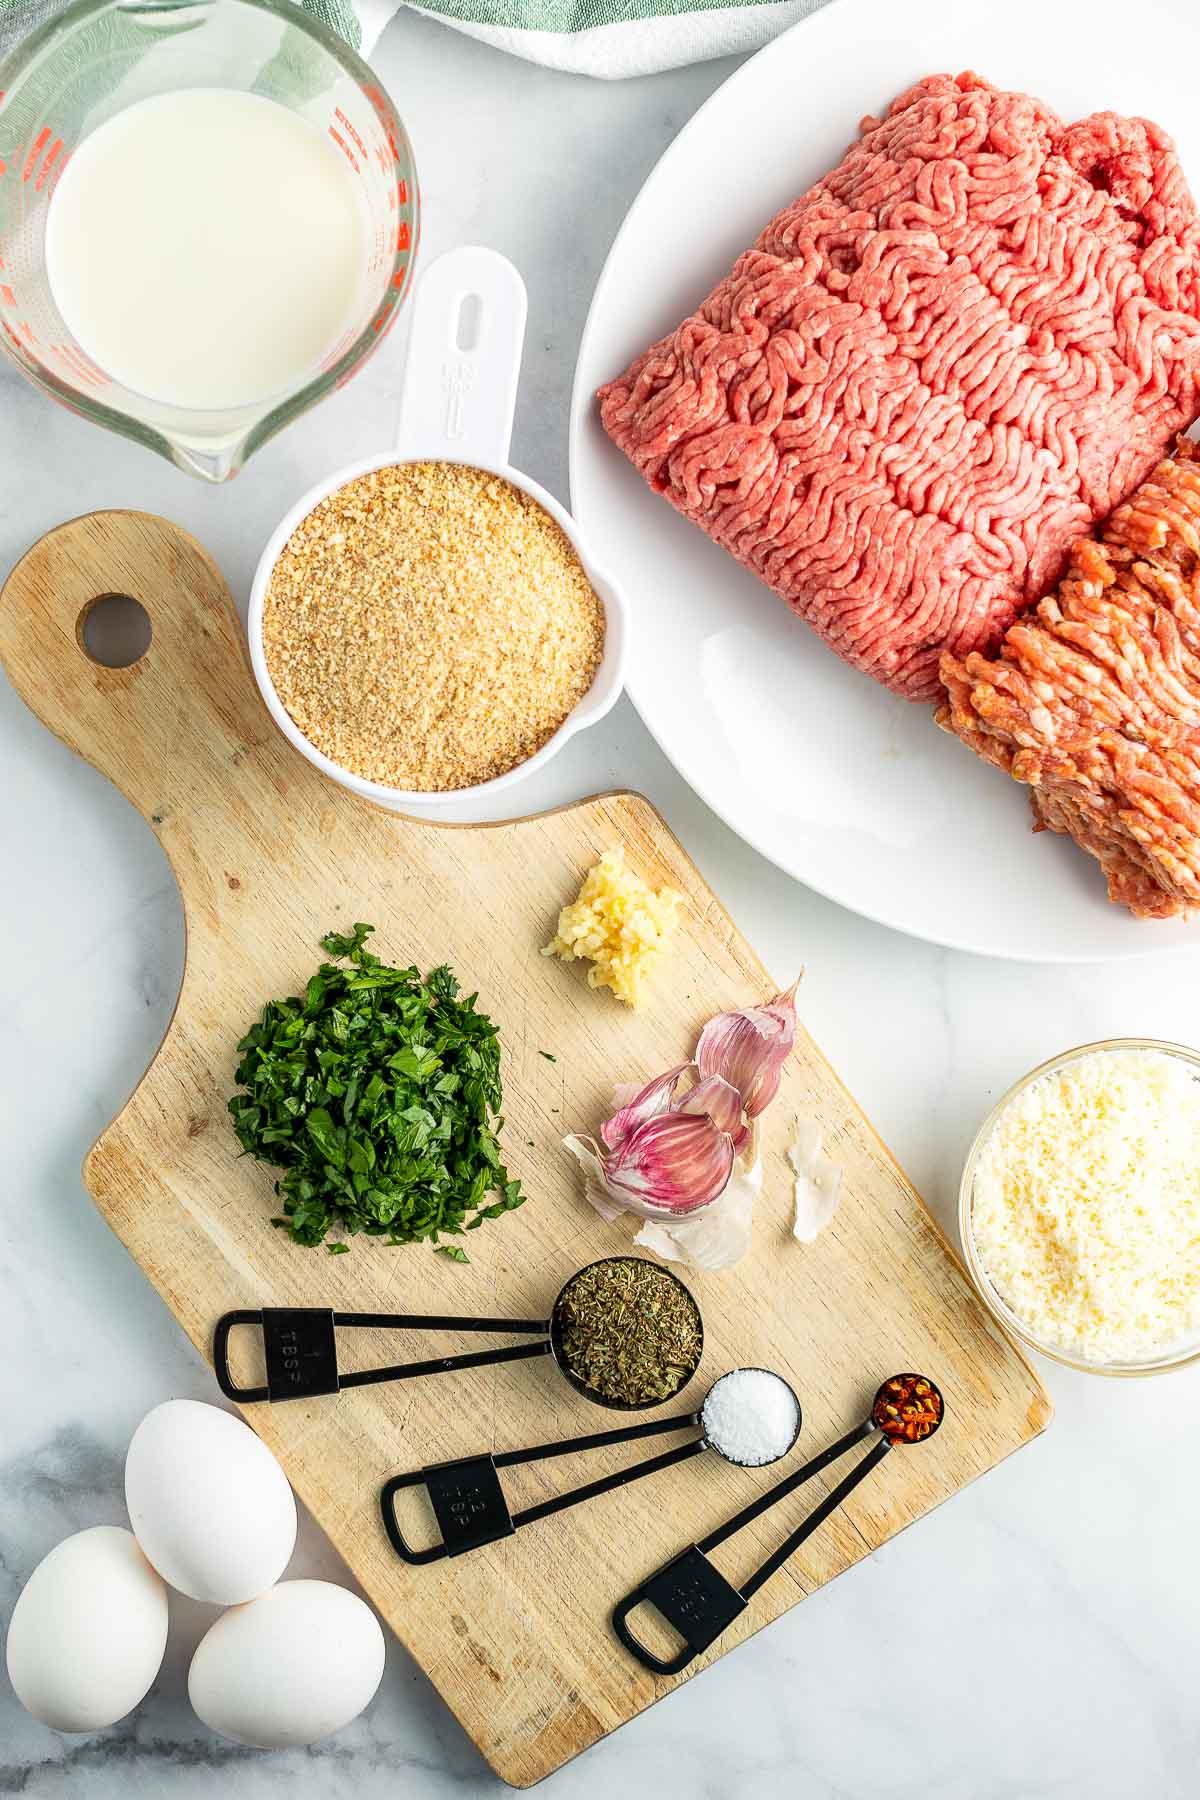 baked Italian Meatballs ingredients